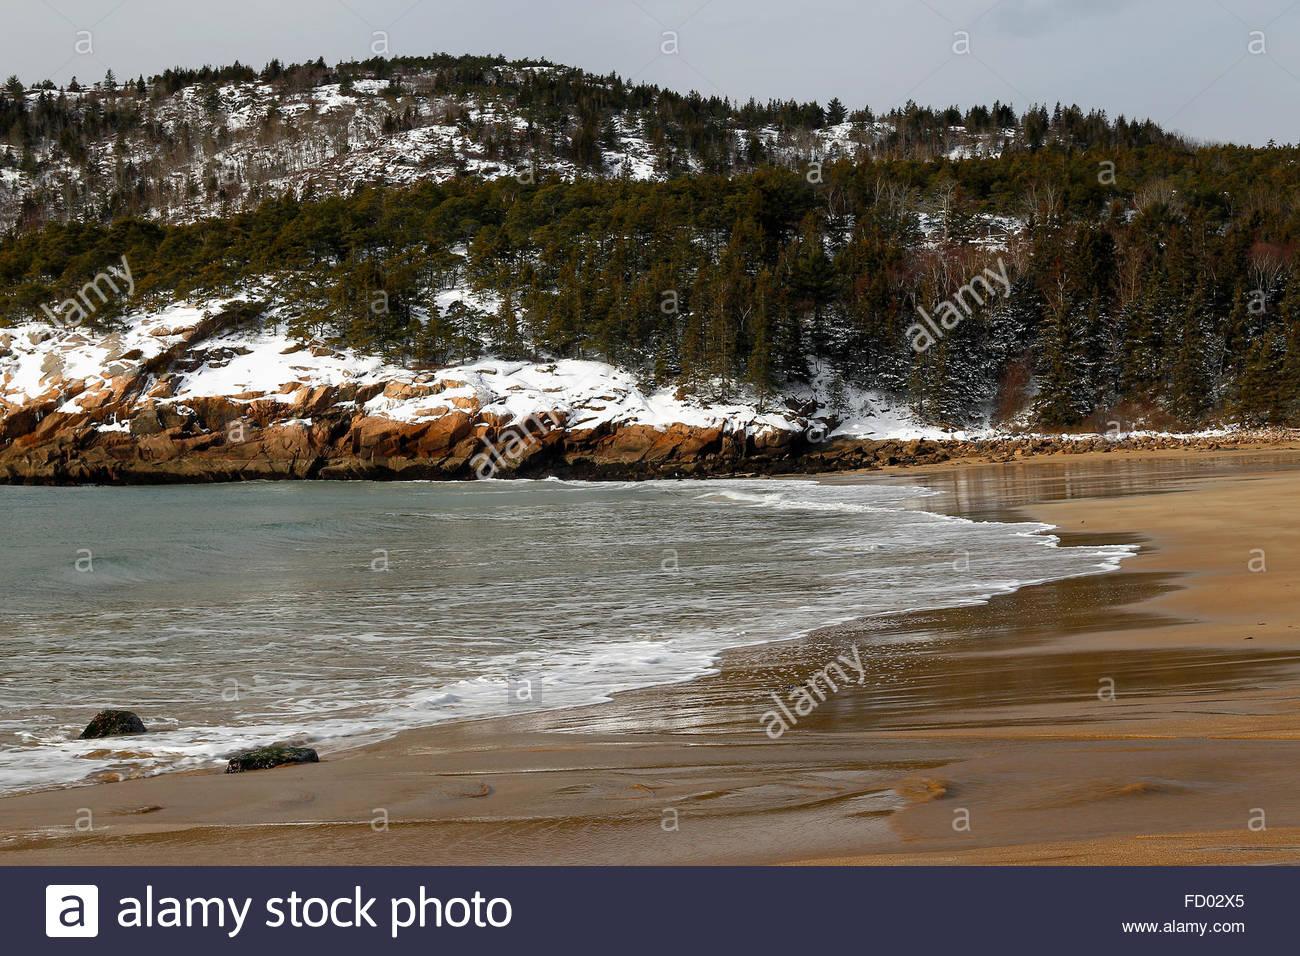 Sand Beach, Acadia National Park, Maine, USA - Stock Image